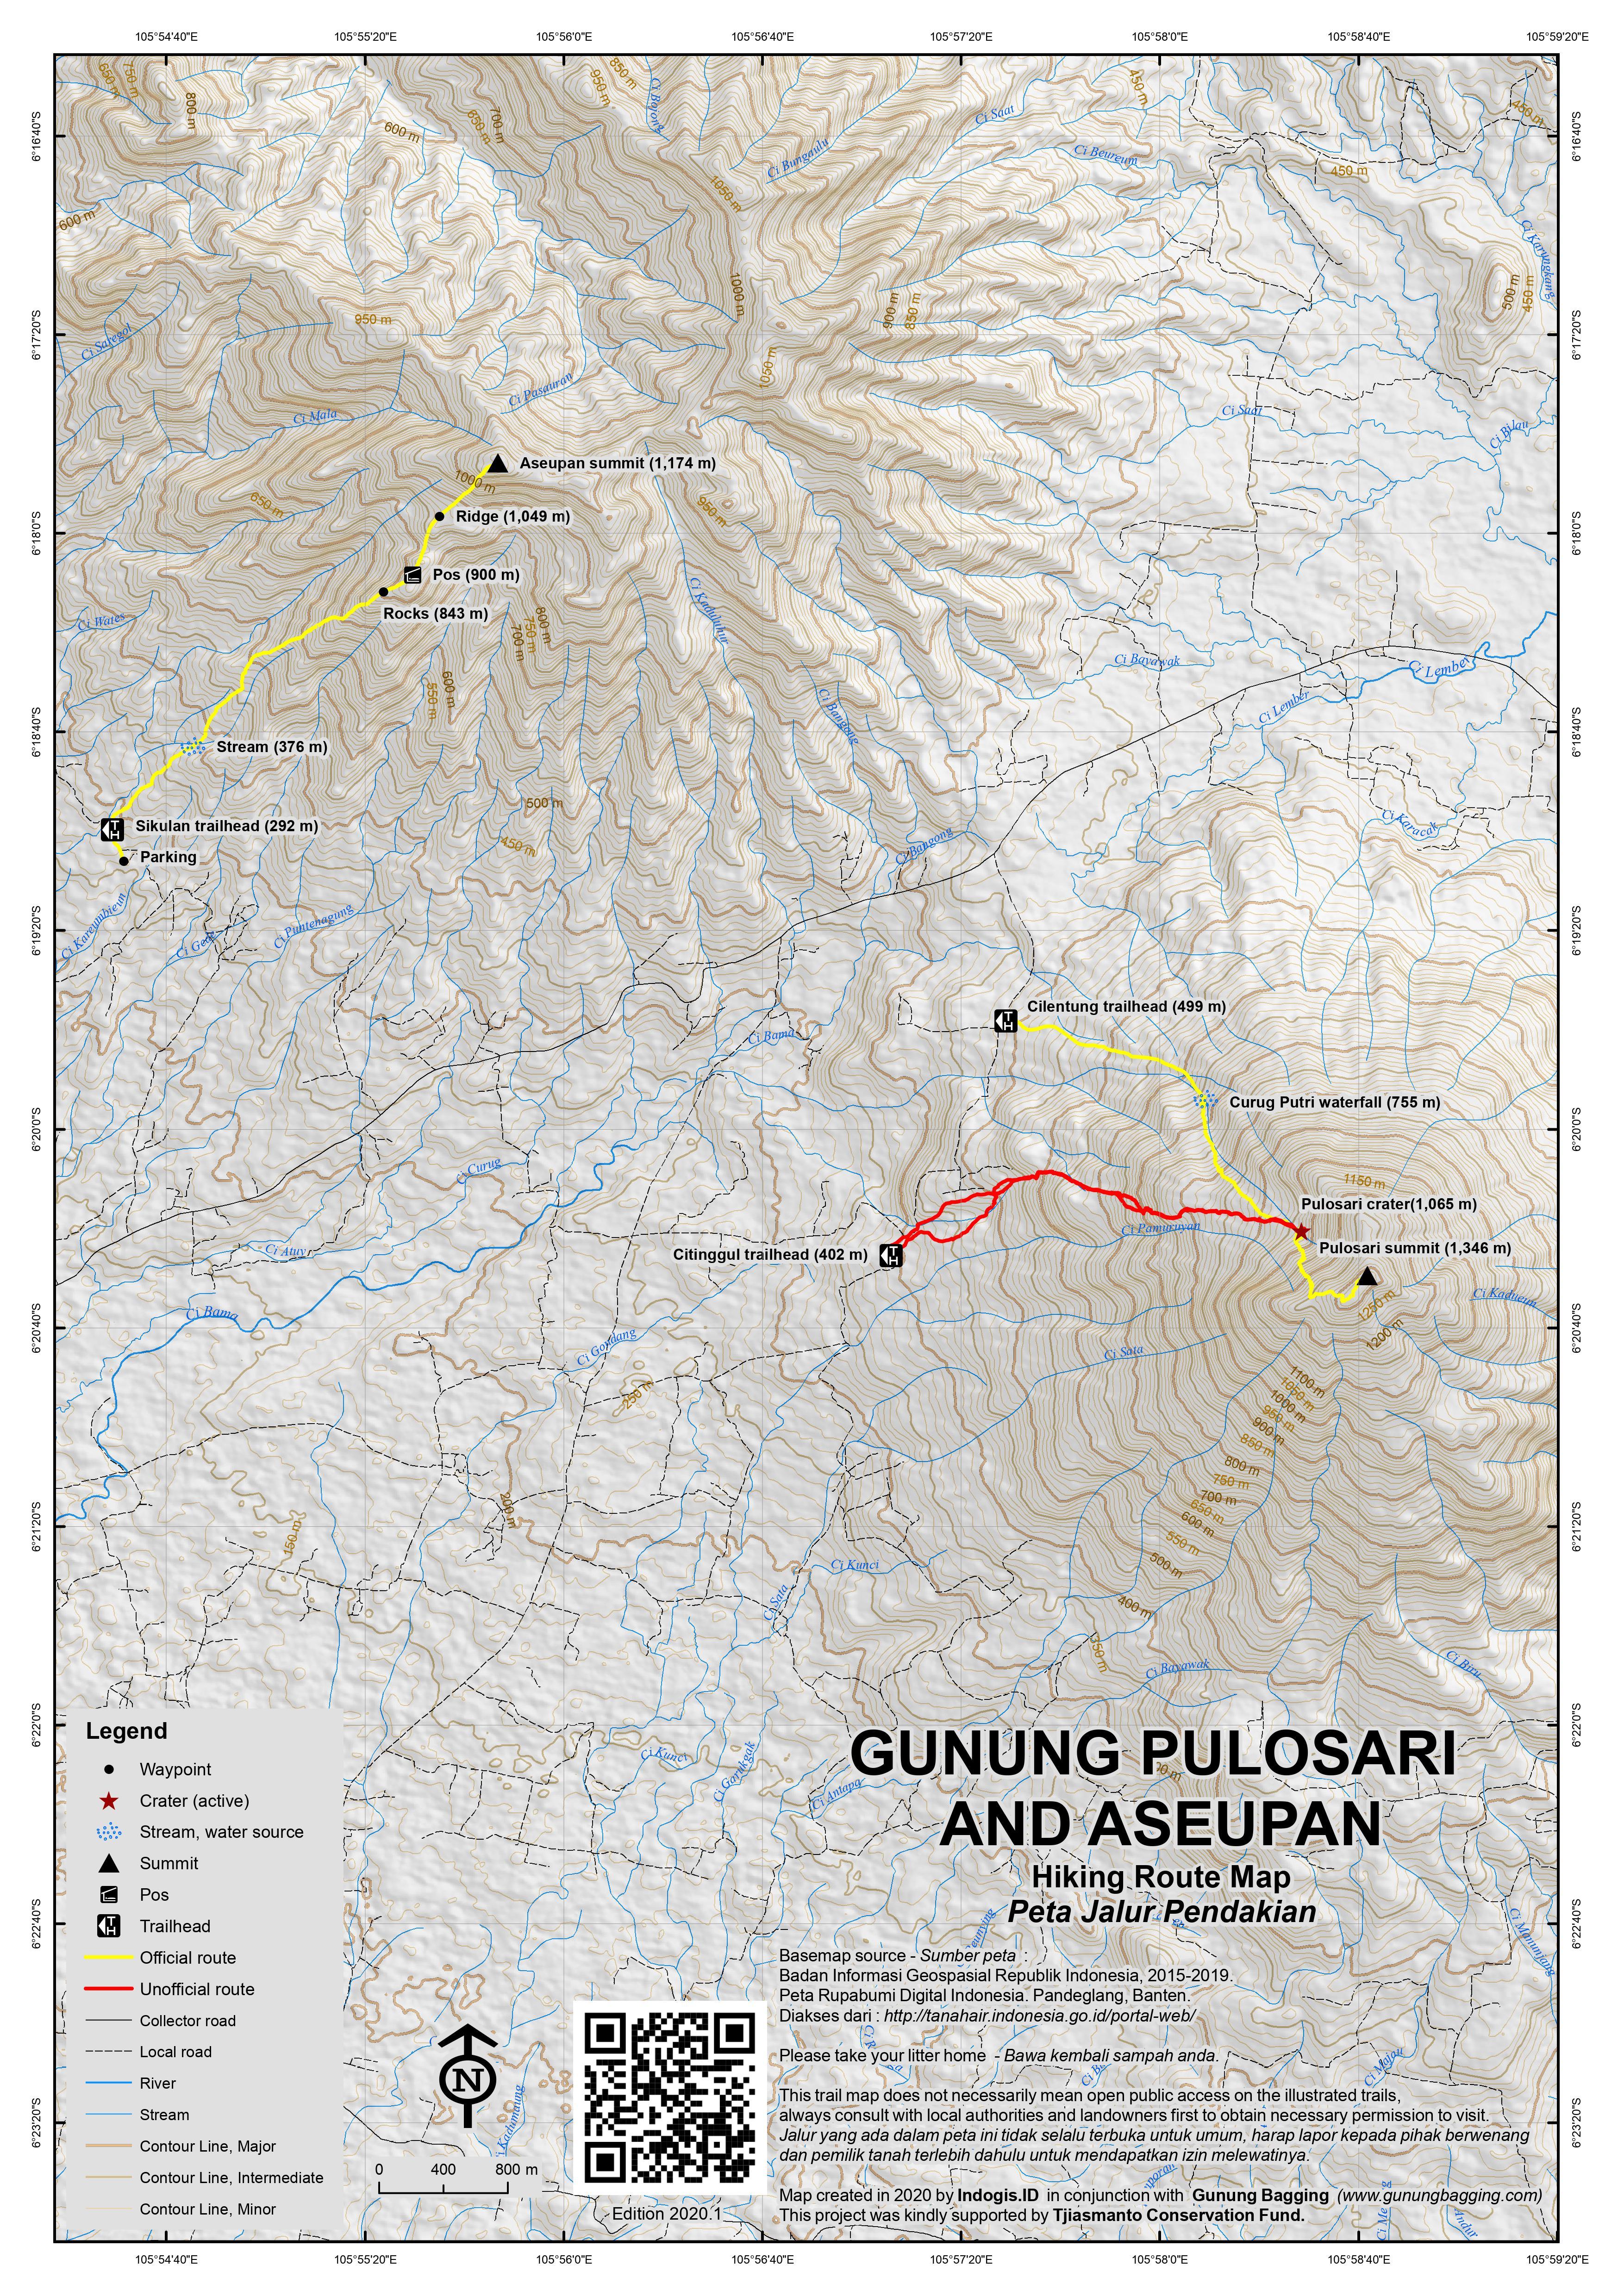 Peta Jalur Pendakian Gunung Pulosari